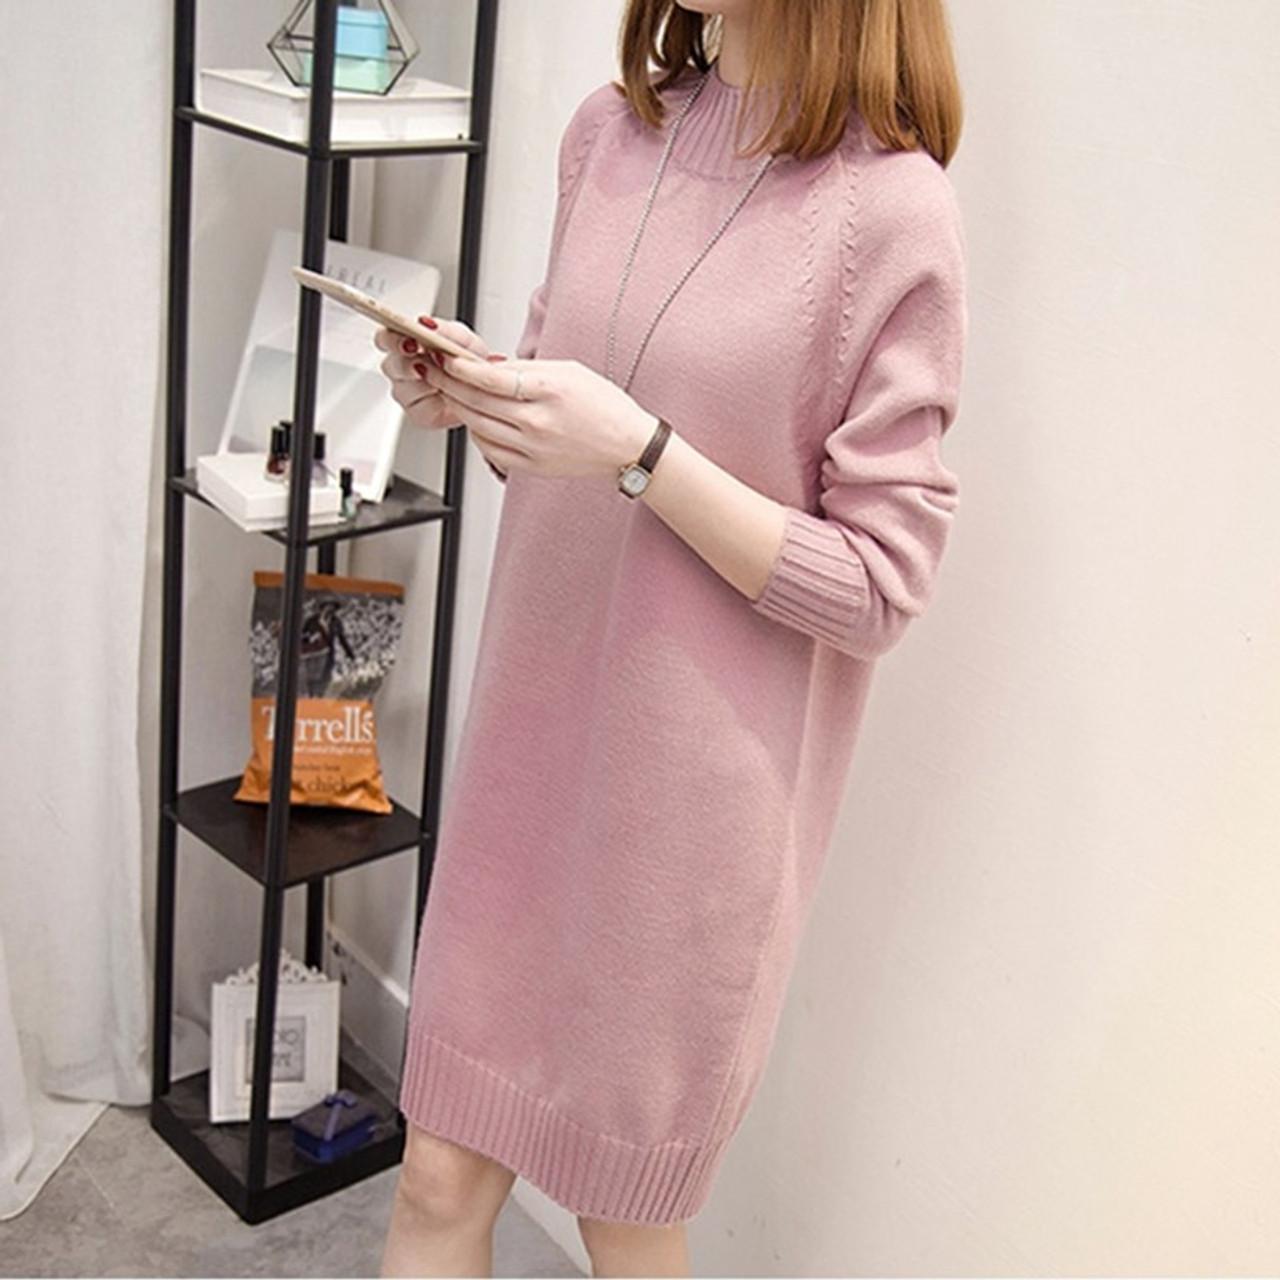 f84a5db8a3b2 ... Autumn Winter Women Long Sweater 2018 New Loose Half Turtleneck Long  Sleeve Knit Pullover Sweater Female ...